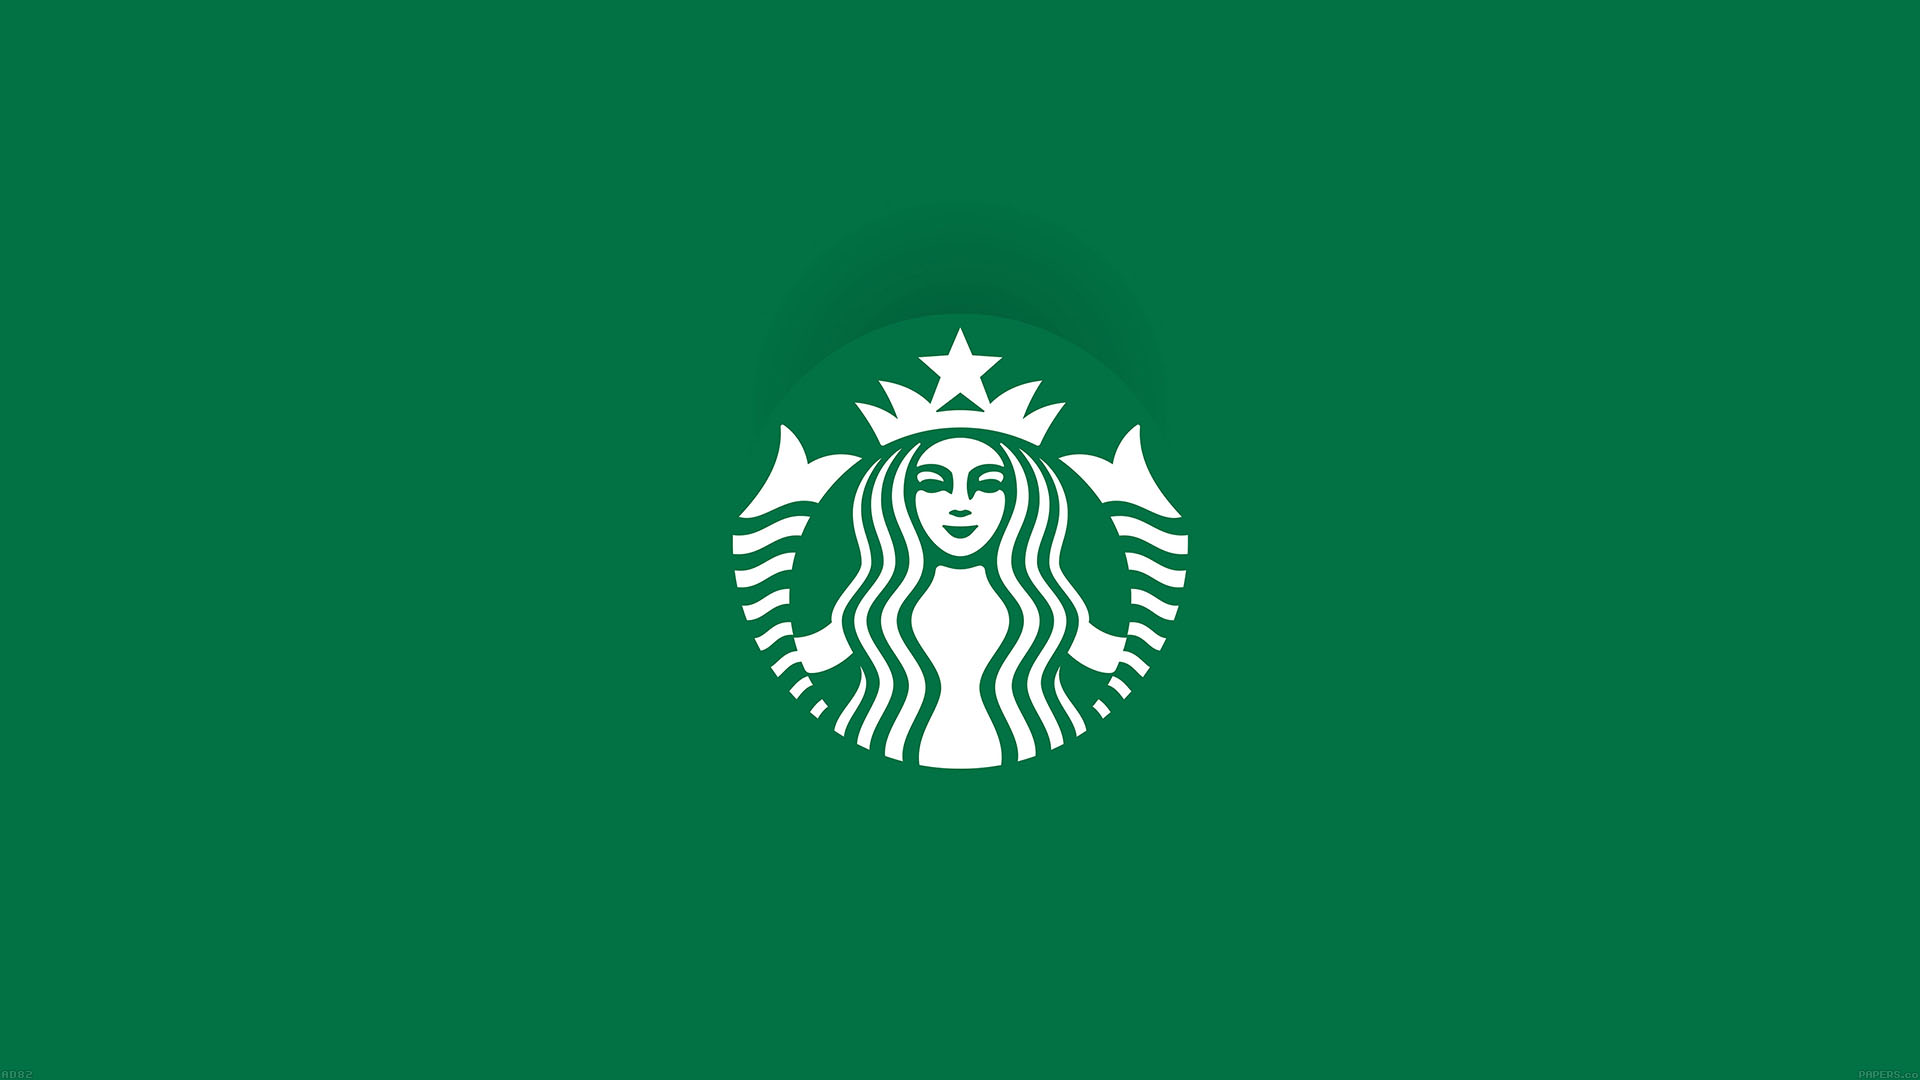 Starbucks Wallpaper Cute Ad82 Starbucks Logo Art Papers Co